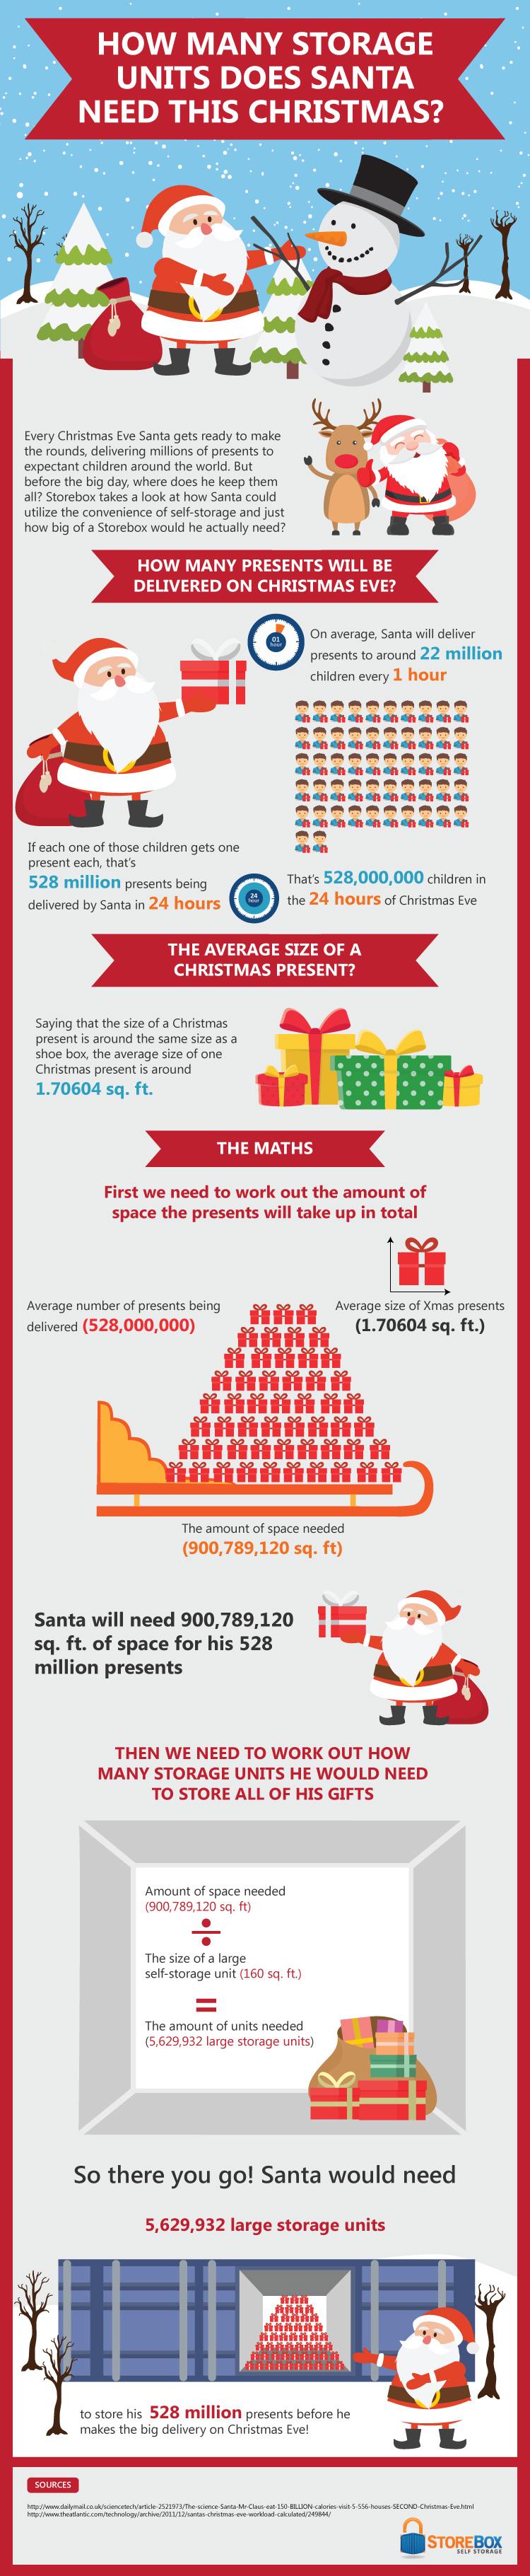 storebox_santa_infographic